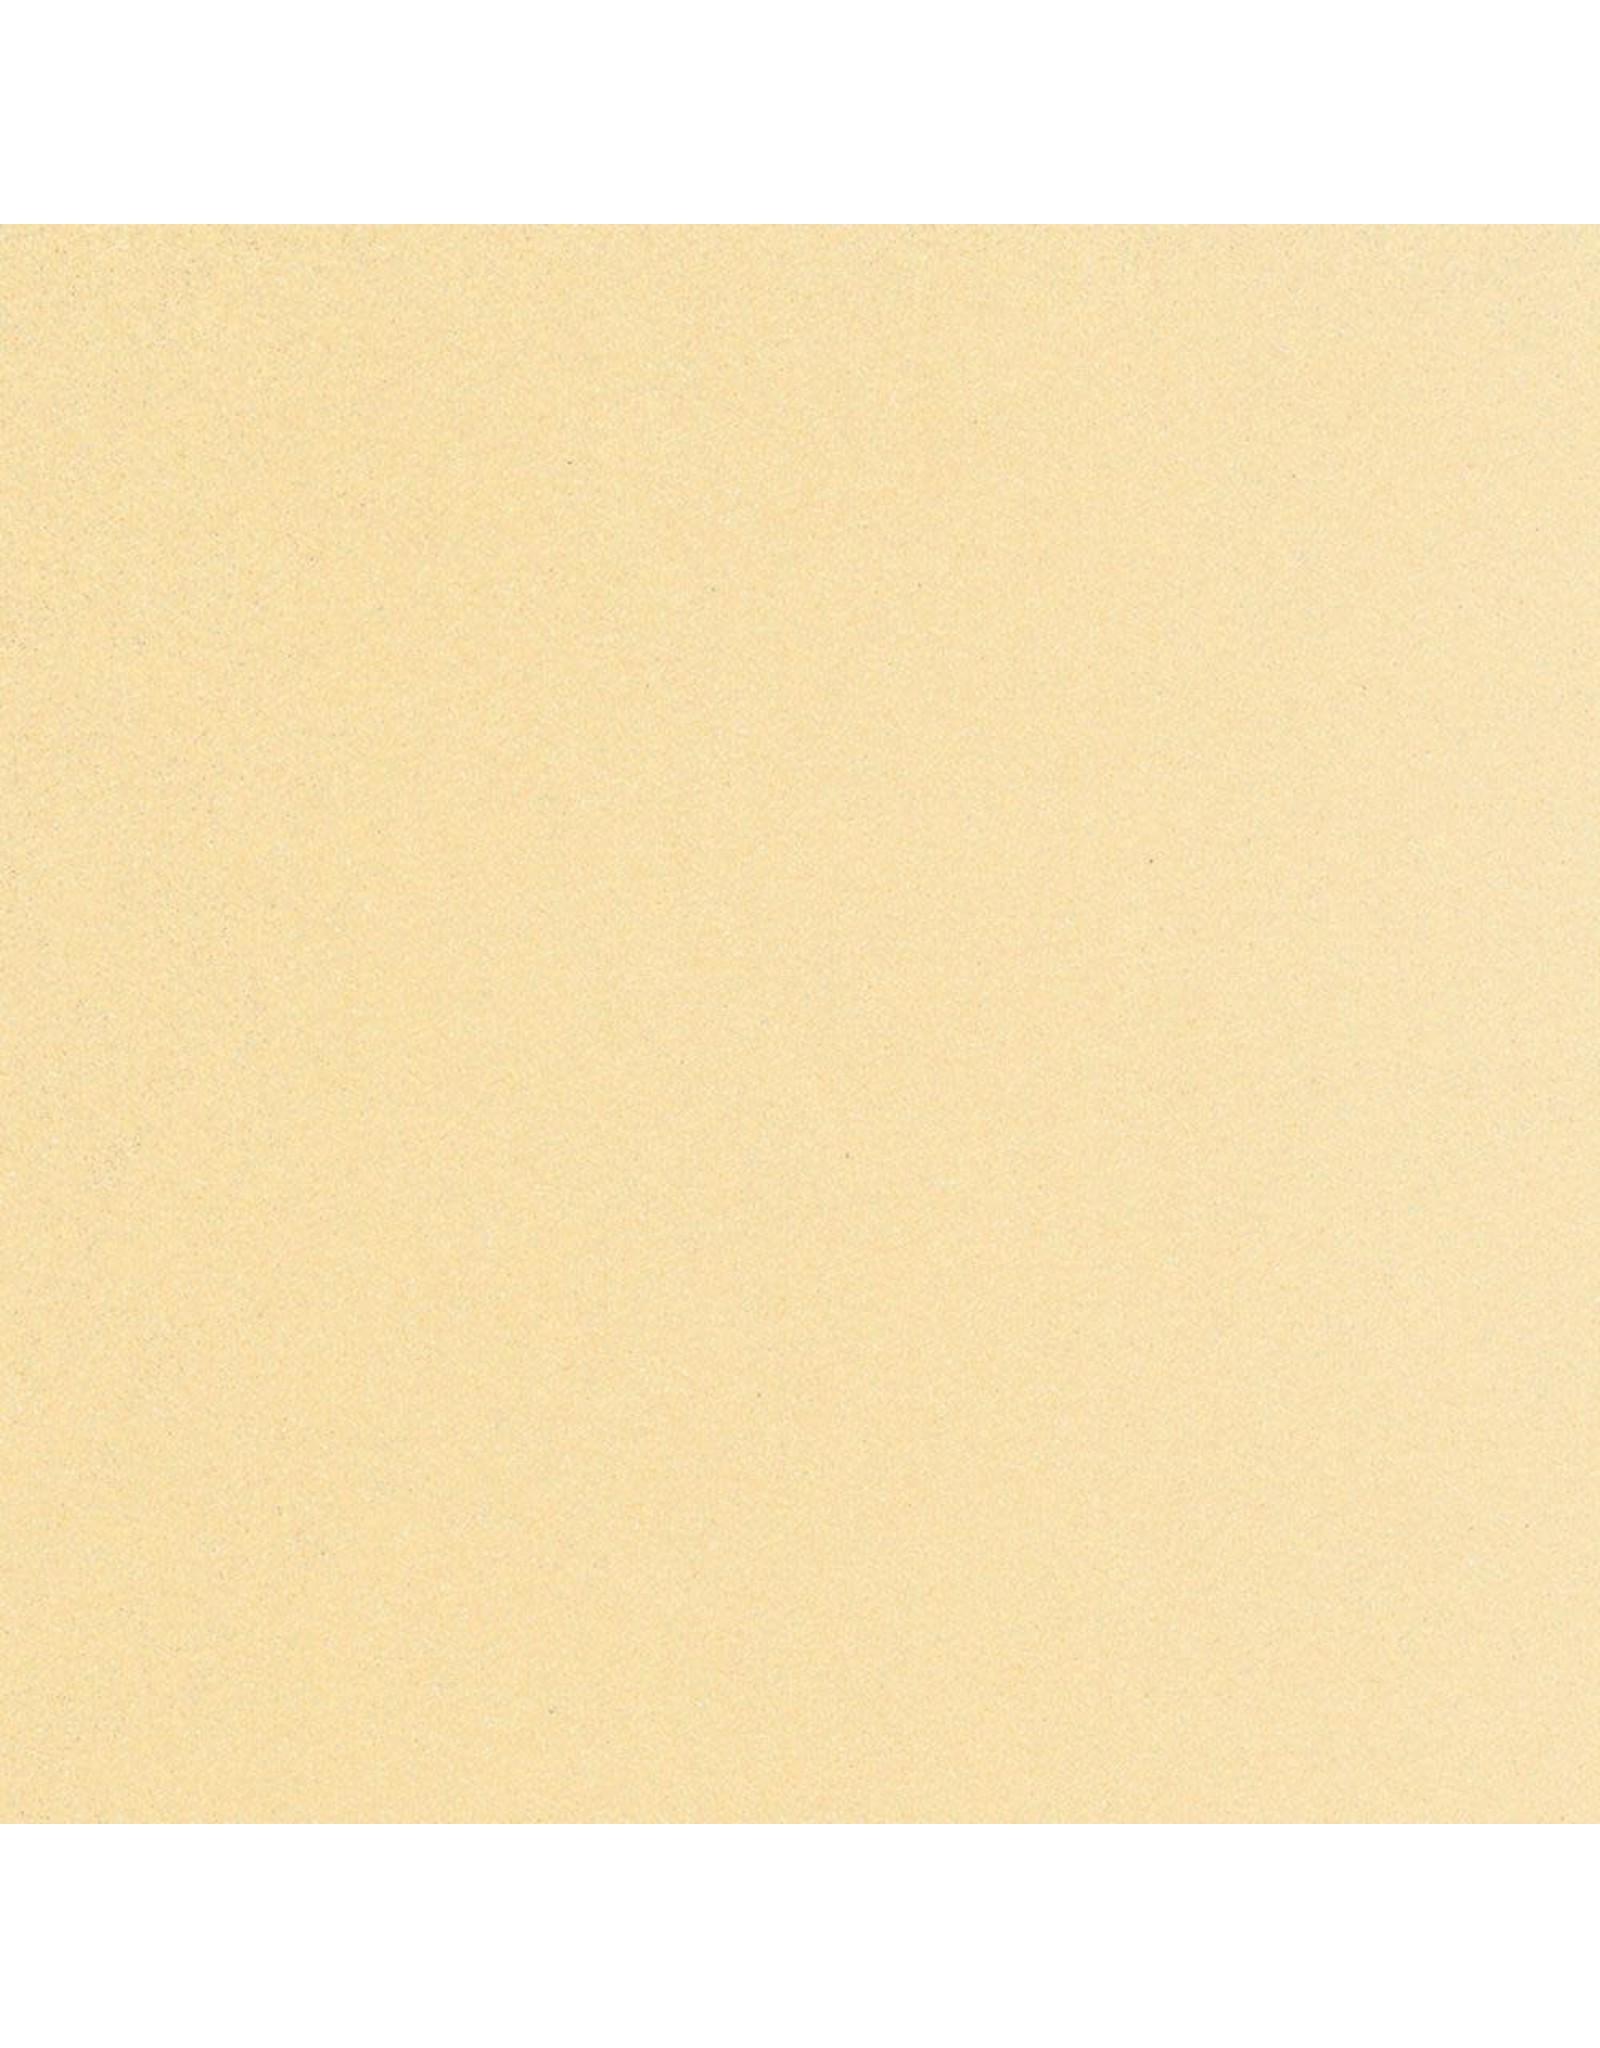 Doodlebug Design 12x12 vanilla sugar coated cardstock